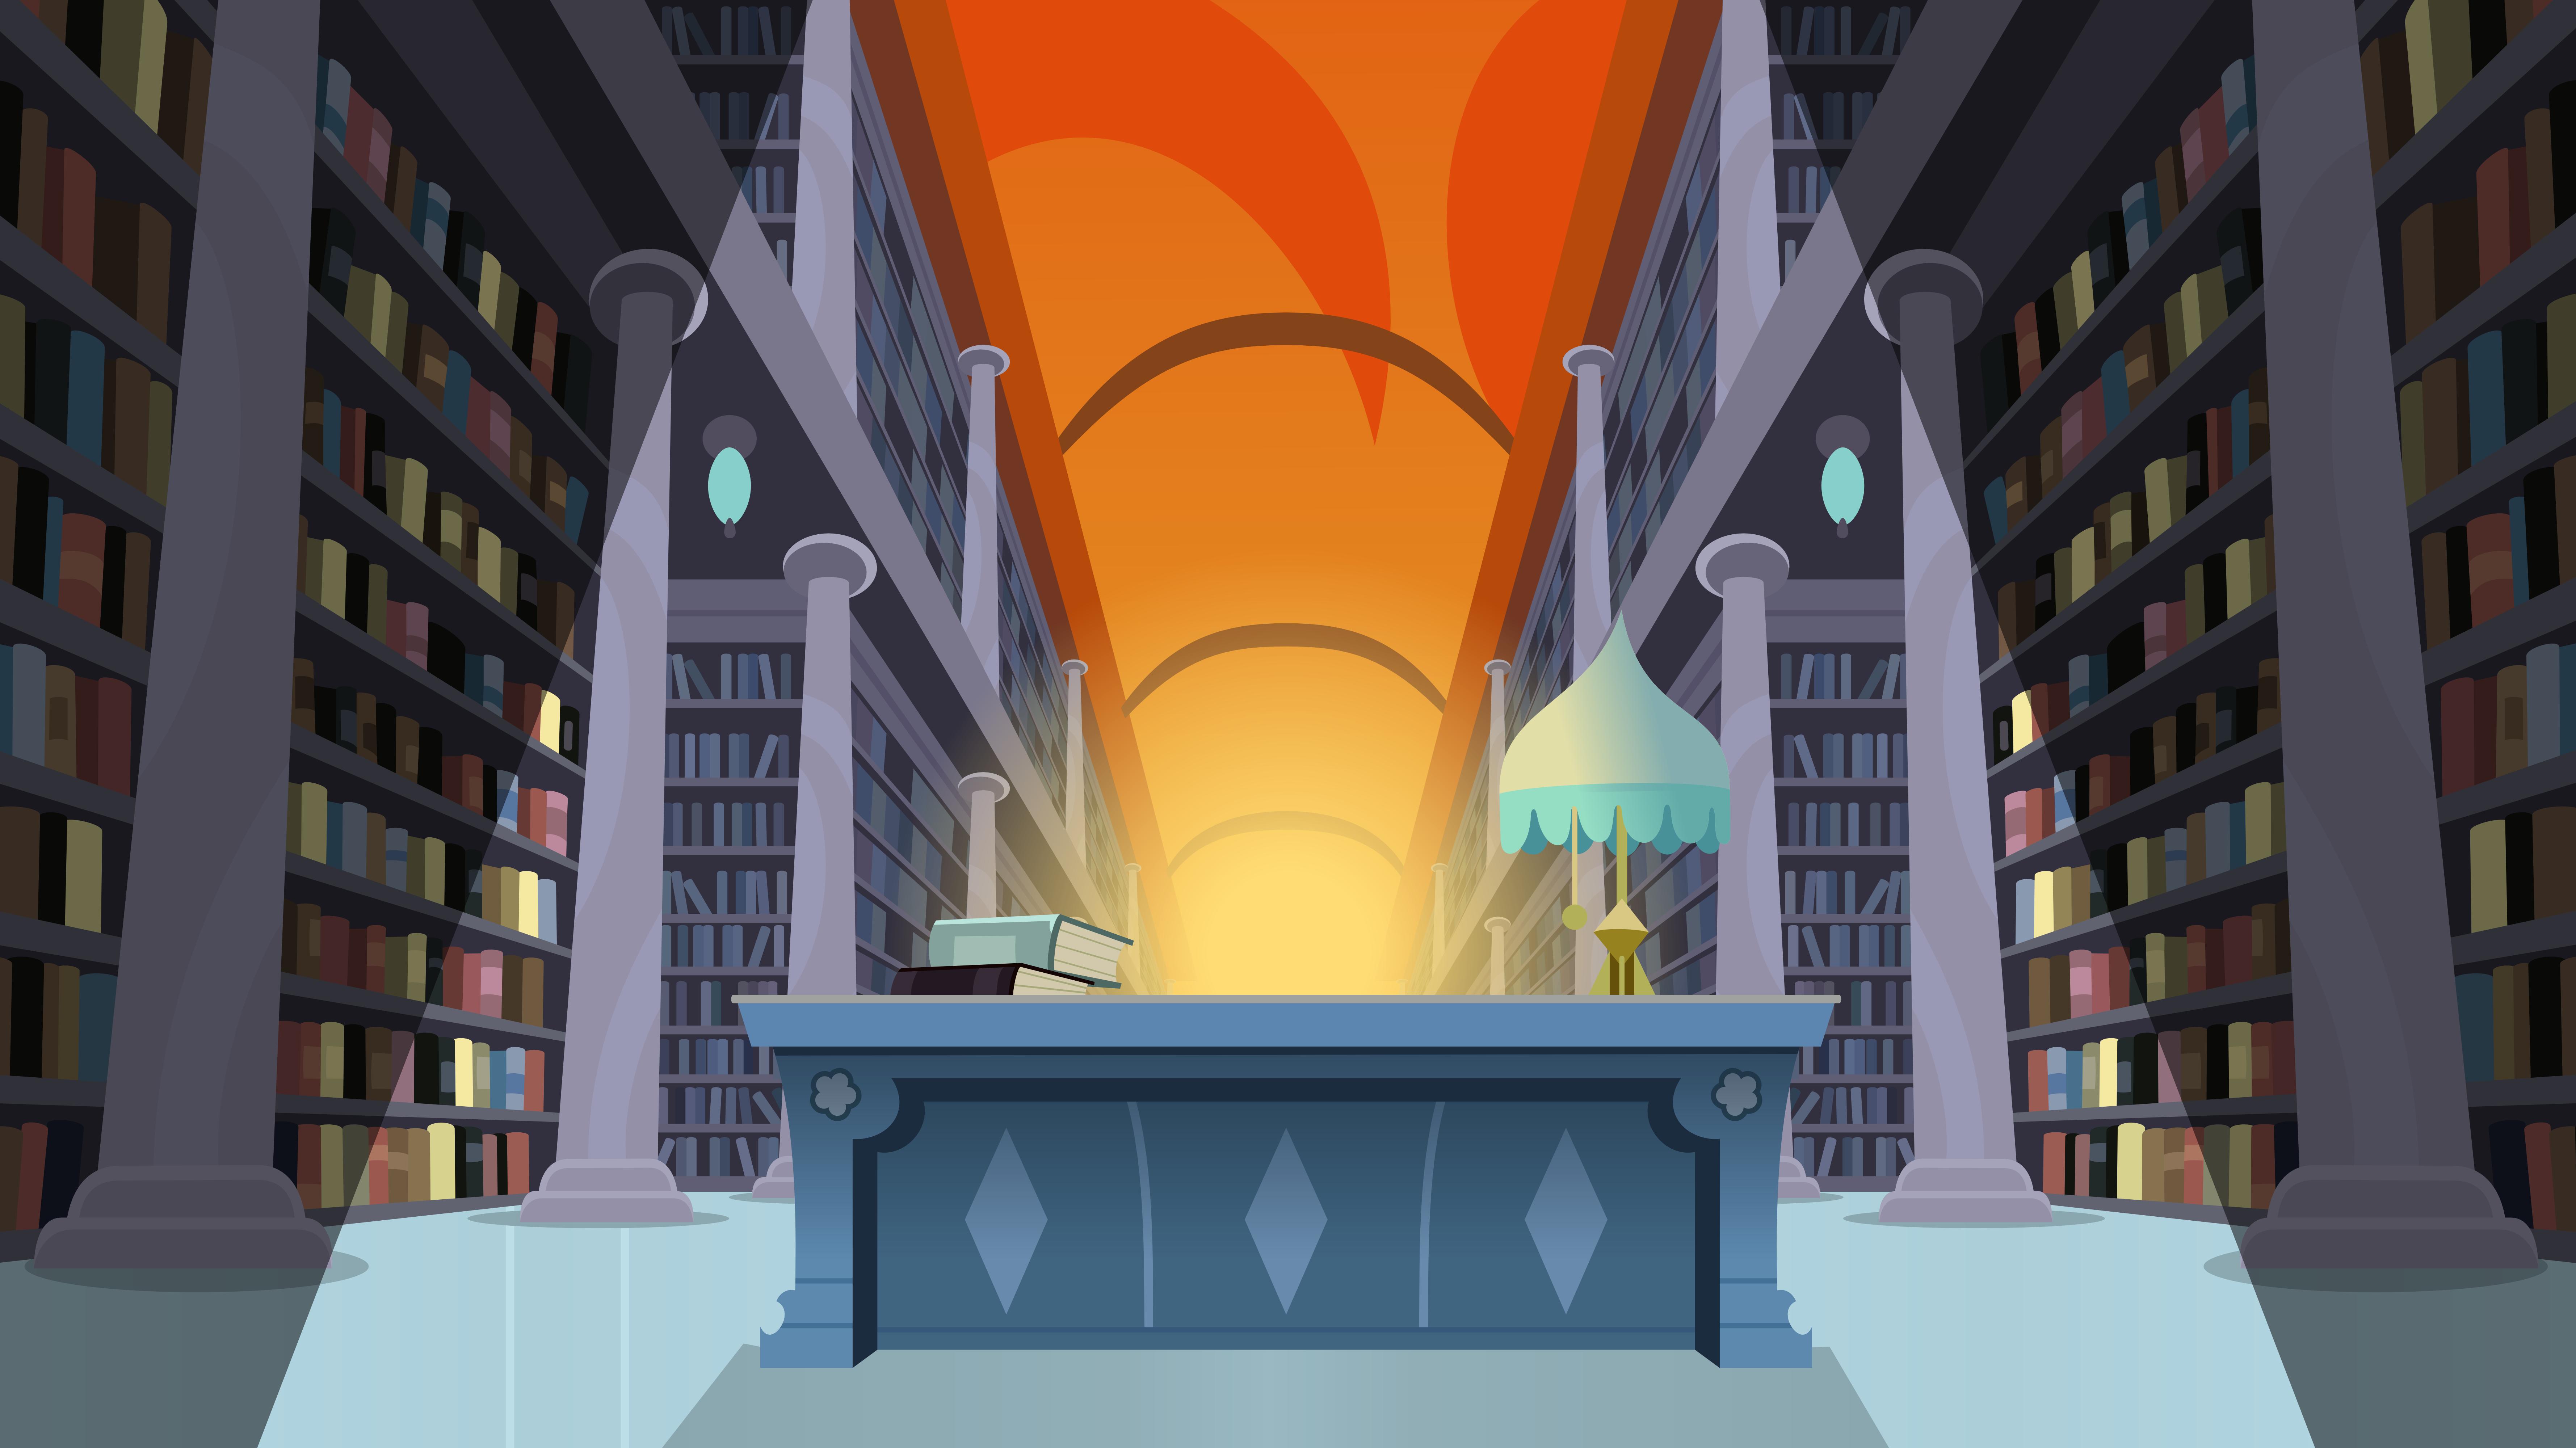 Dream Library By Jeatz Axl On Deviantart